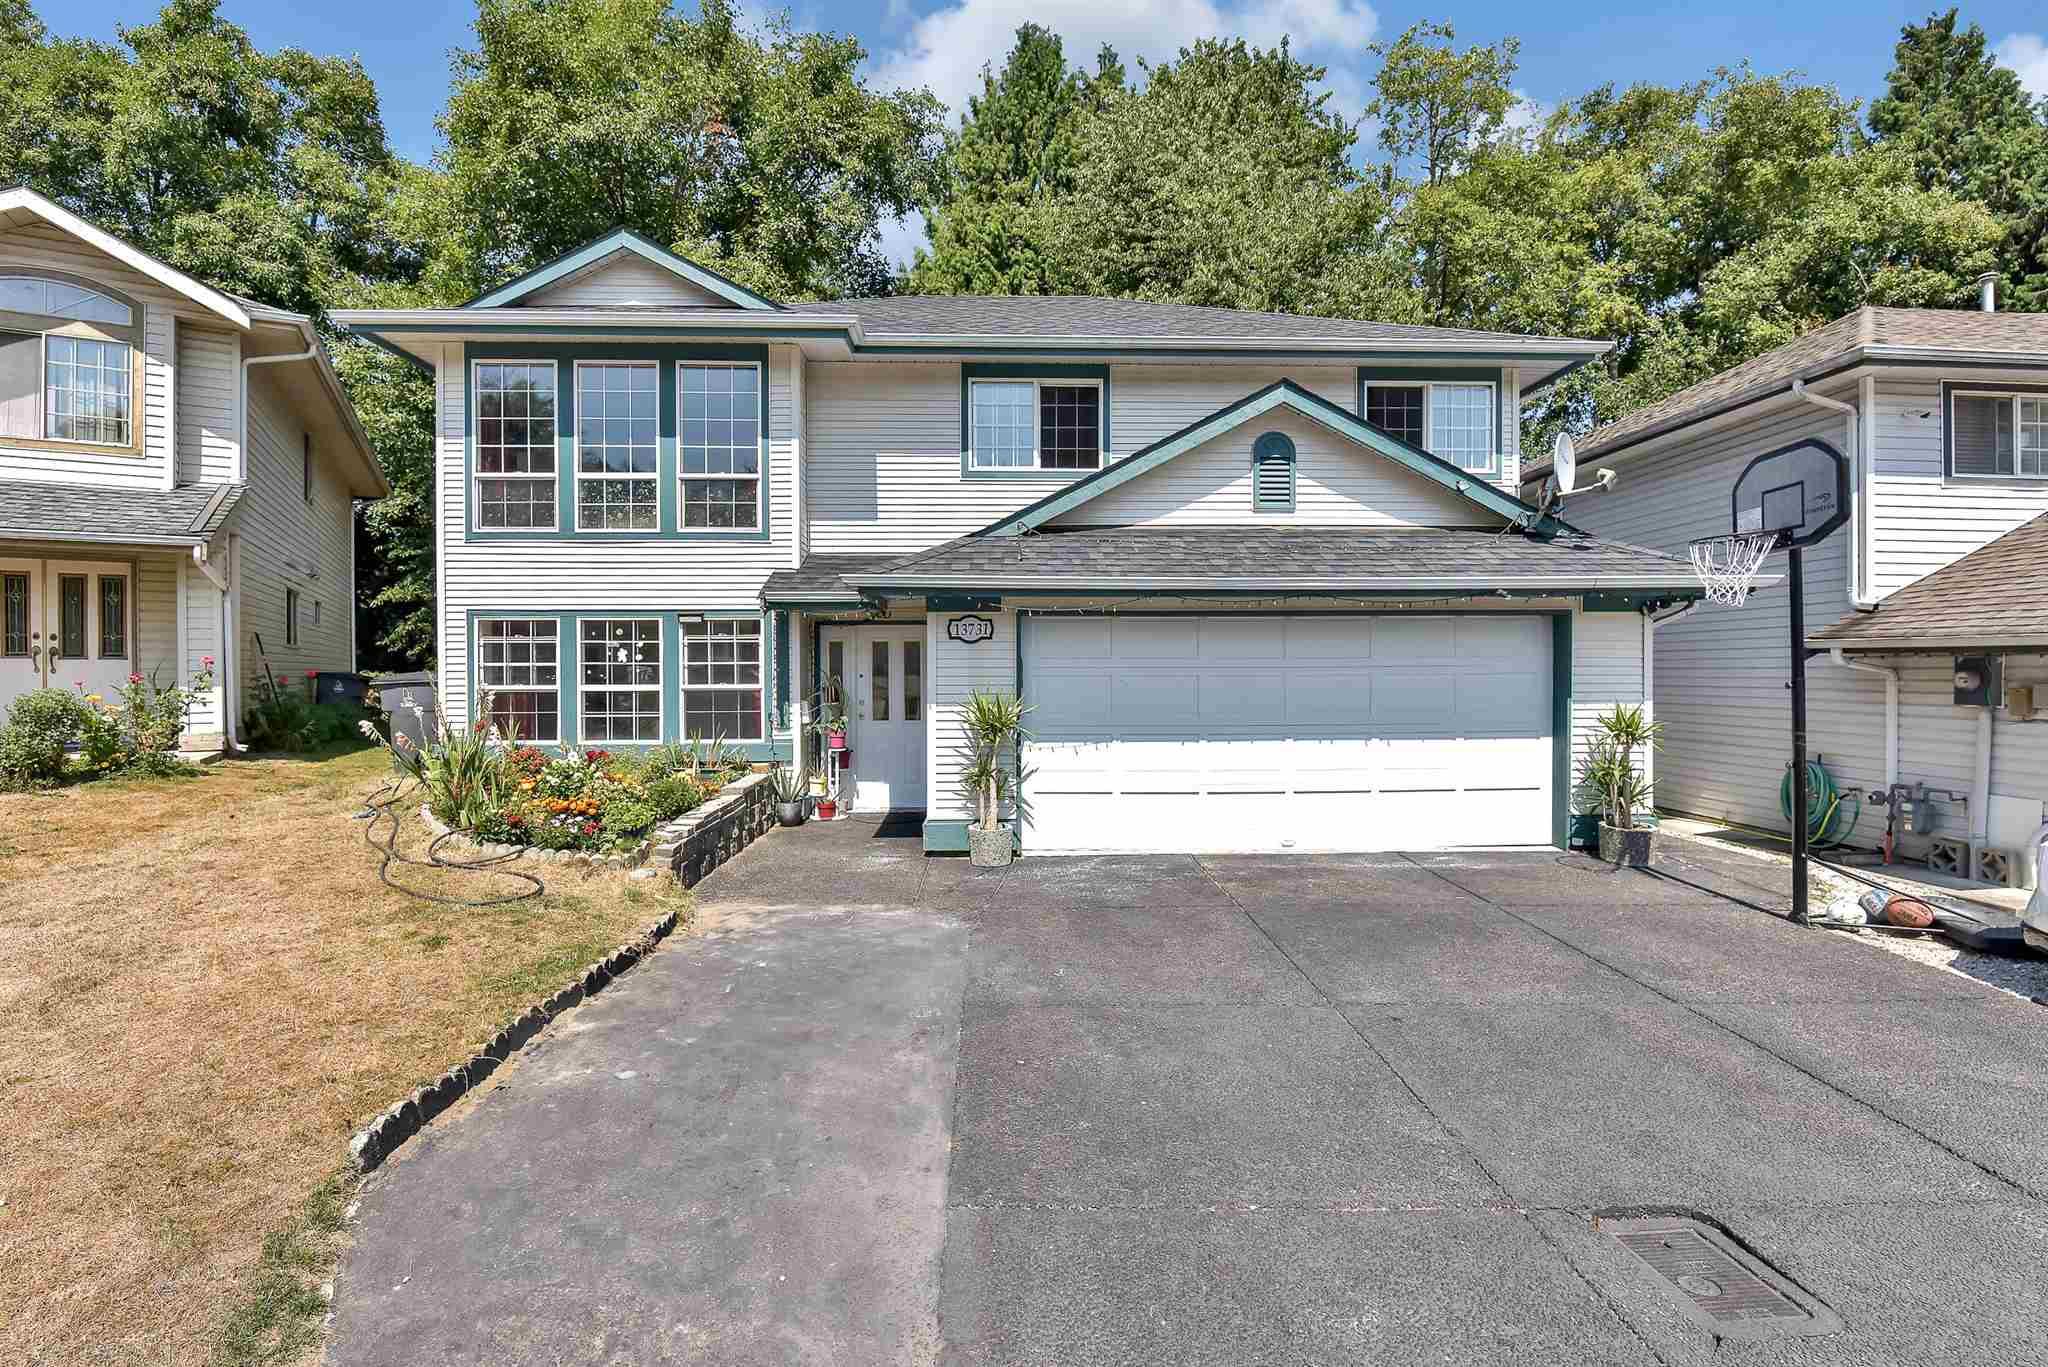 13731 63B AVENUE - Sullivan Station House/Single Family for sale, 5 Bedrooms (R2606812)